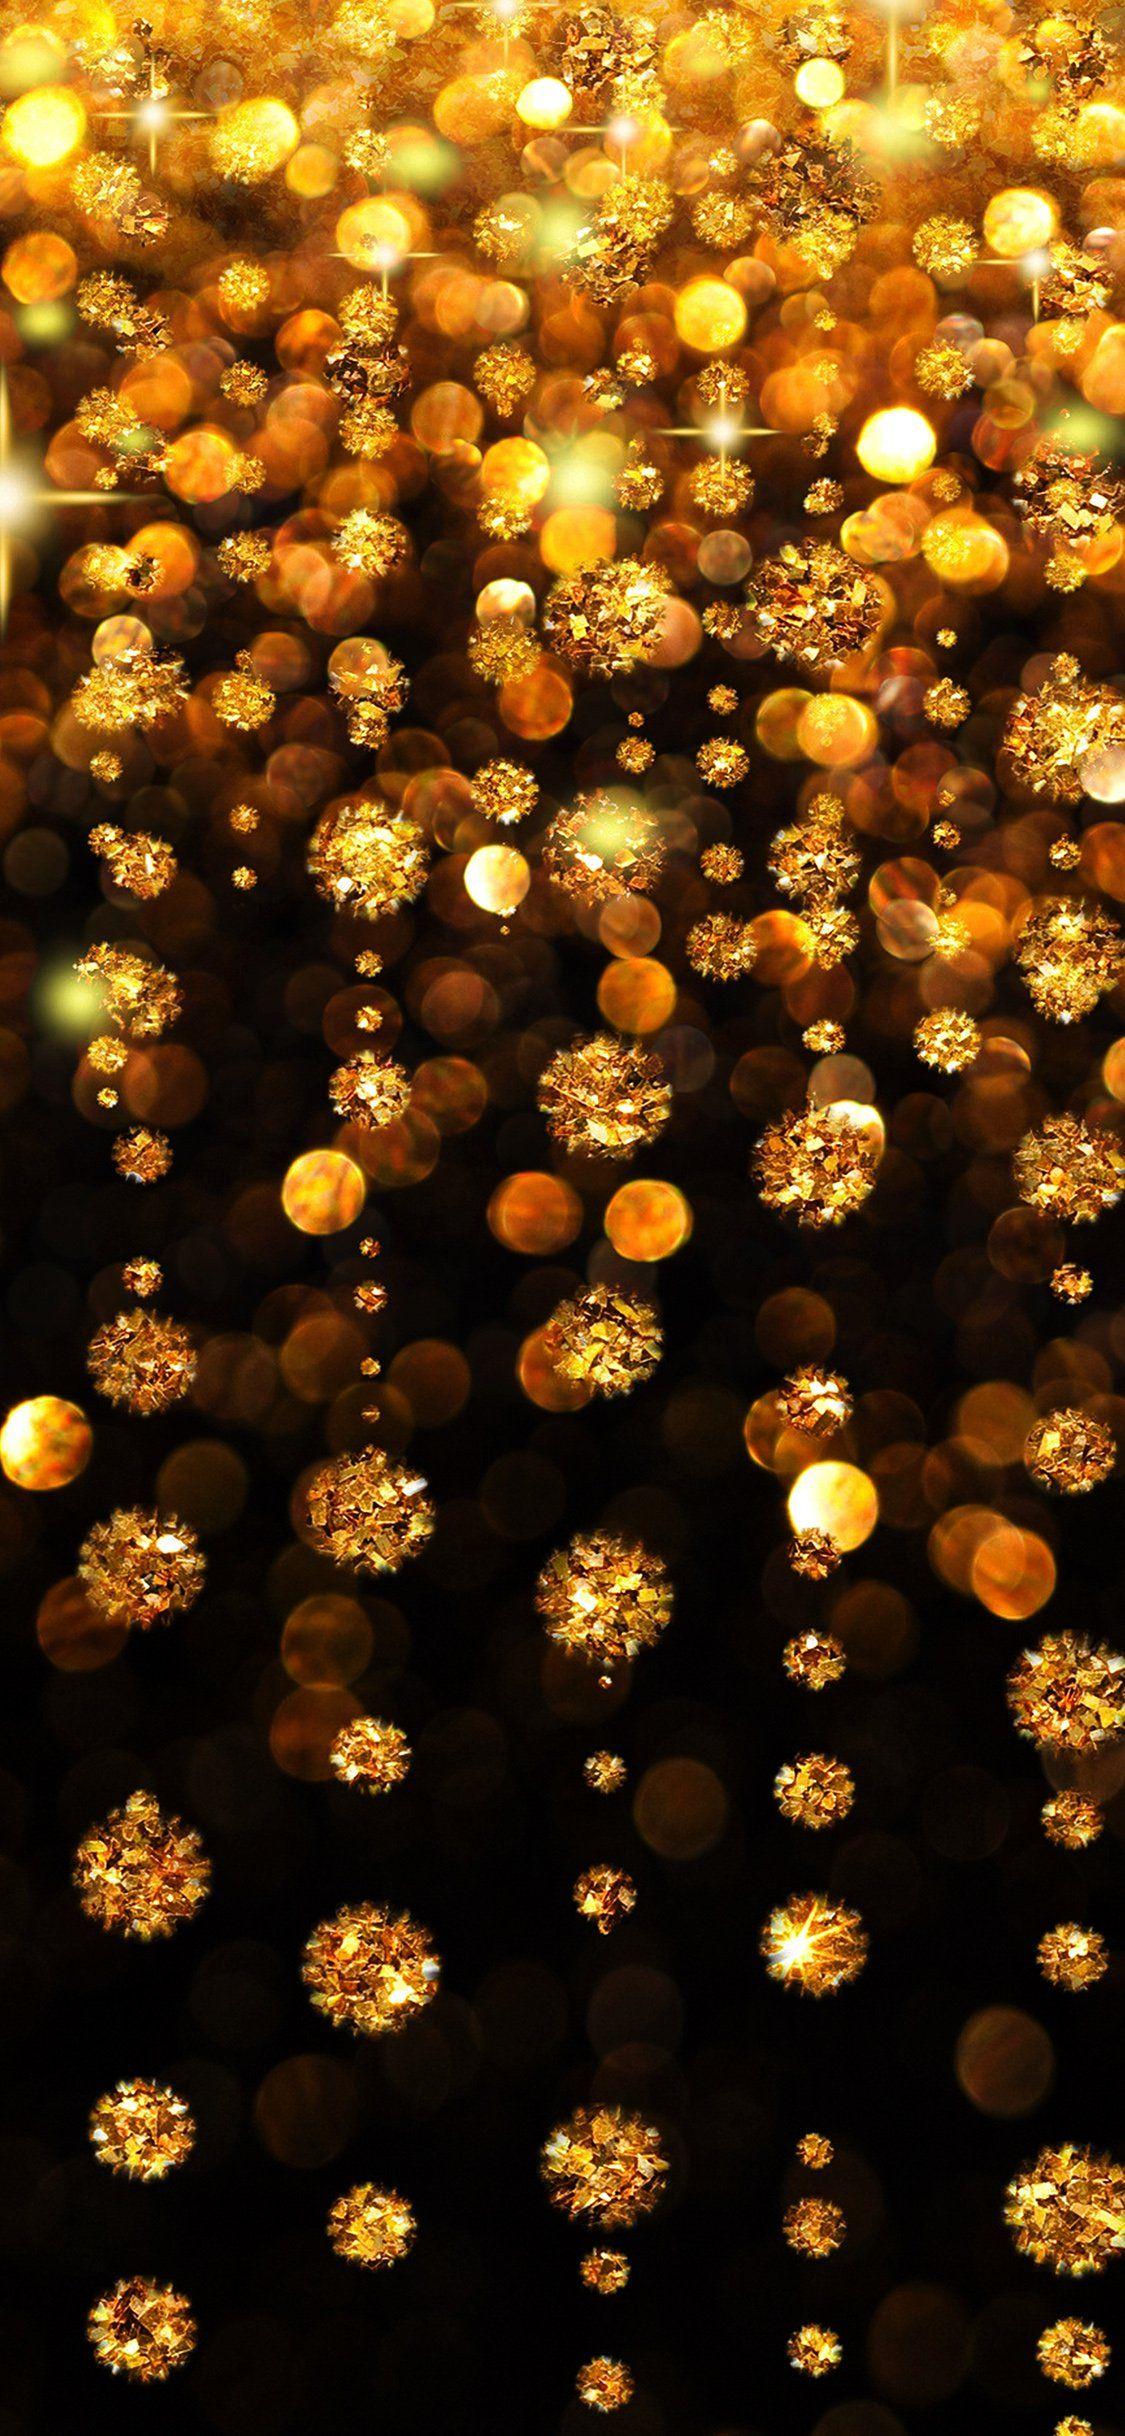 2018 Iphone Wallpapers صور خلفيات ايفون Hd روعه Tecnologis Iphone Wallpaper Wallpaper Iphone Christmas Iphone Light